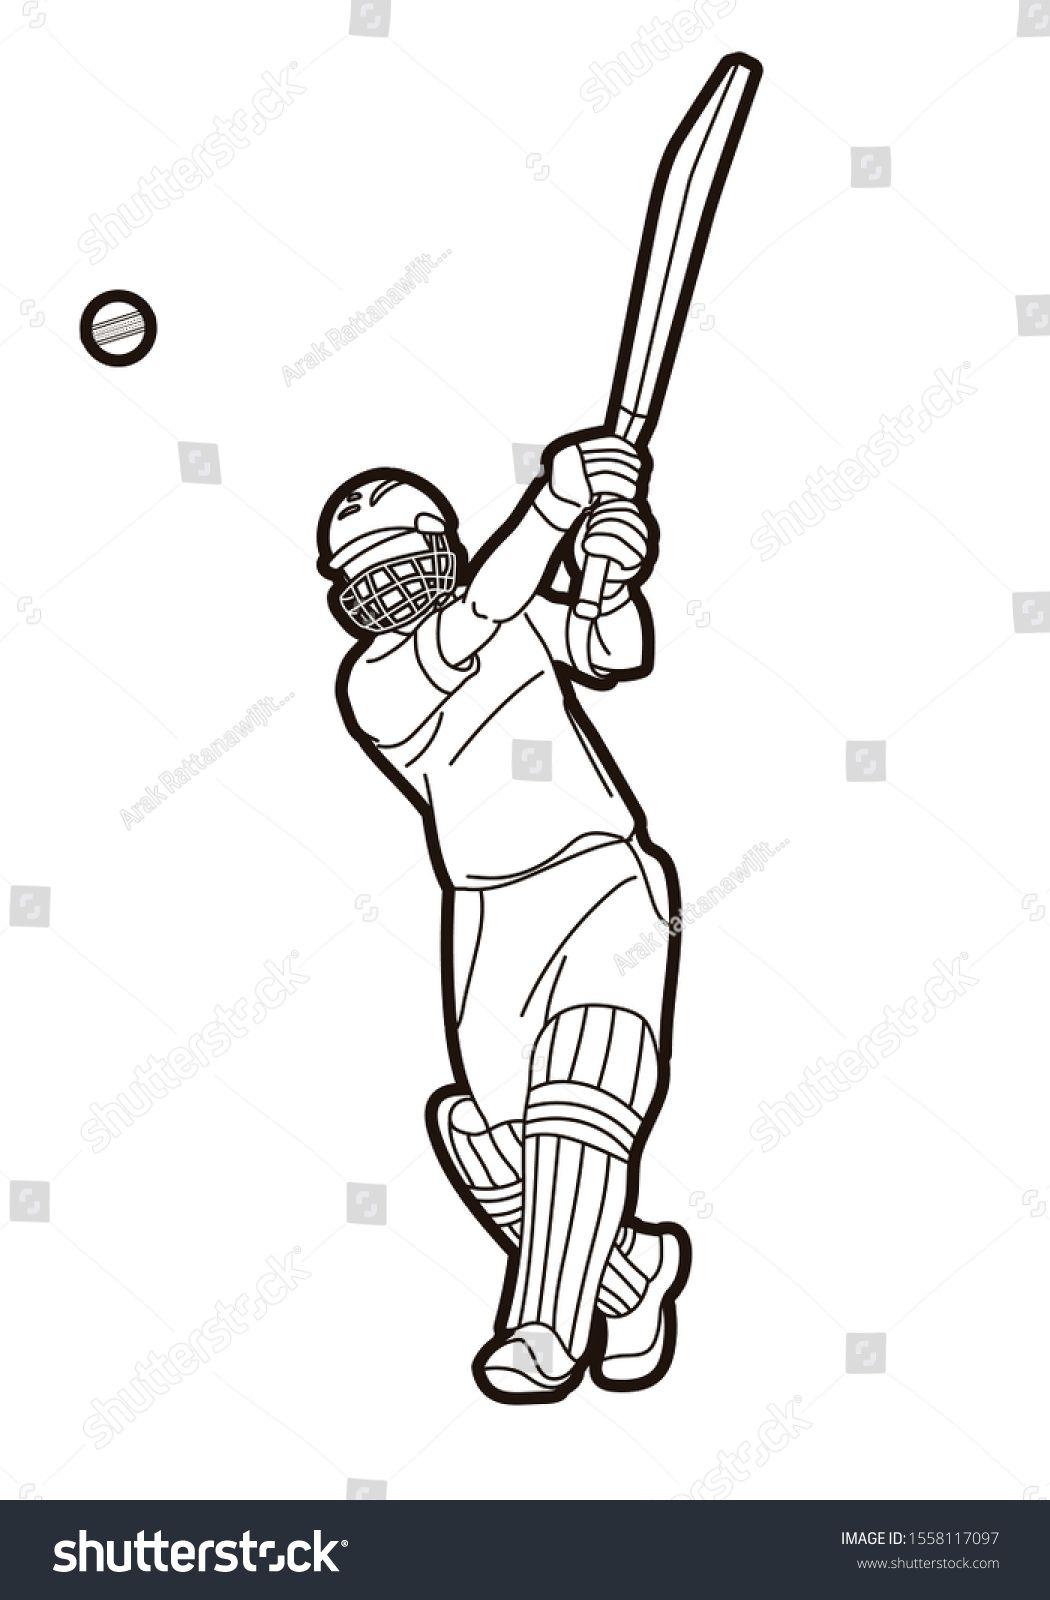 Cricket Batsman Sport Player Action Cartoon Graphic Vector Ad Ad Sport Player Cricket Batsman Sport Player Players Cartoon